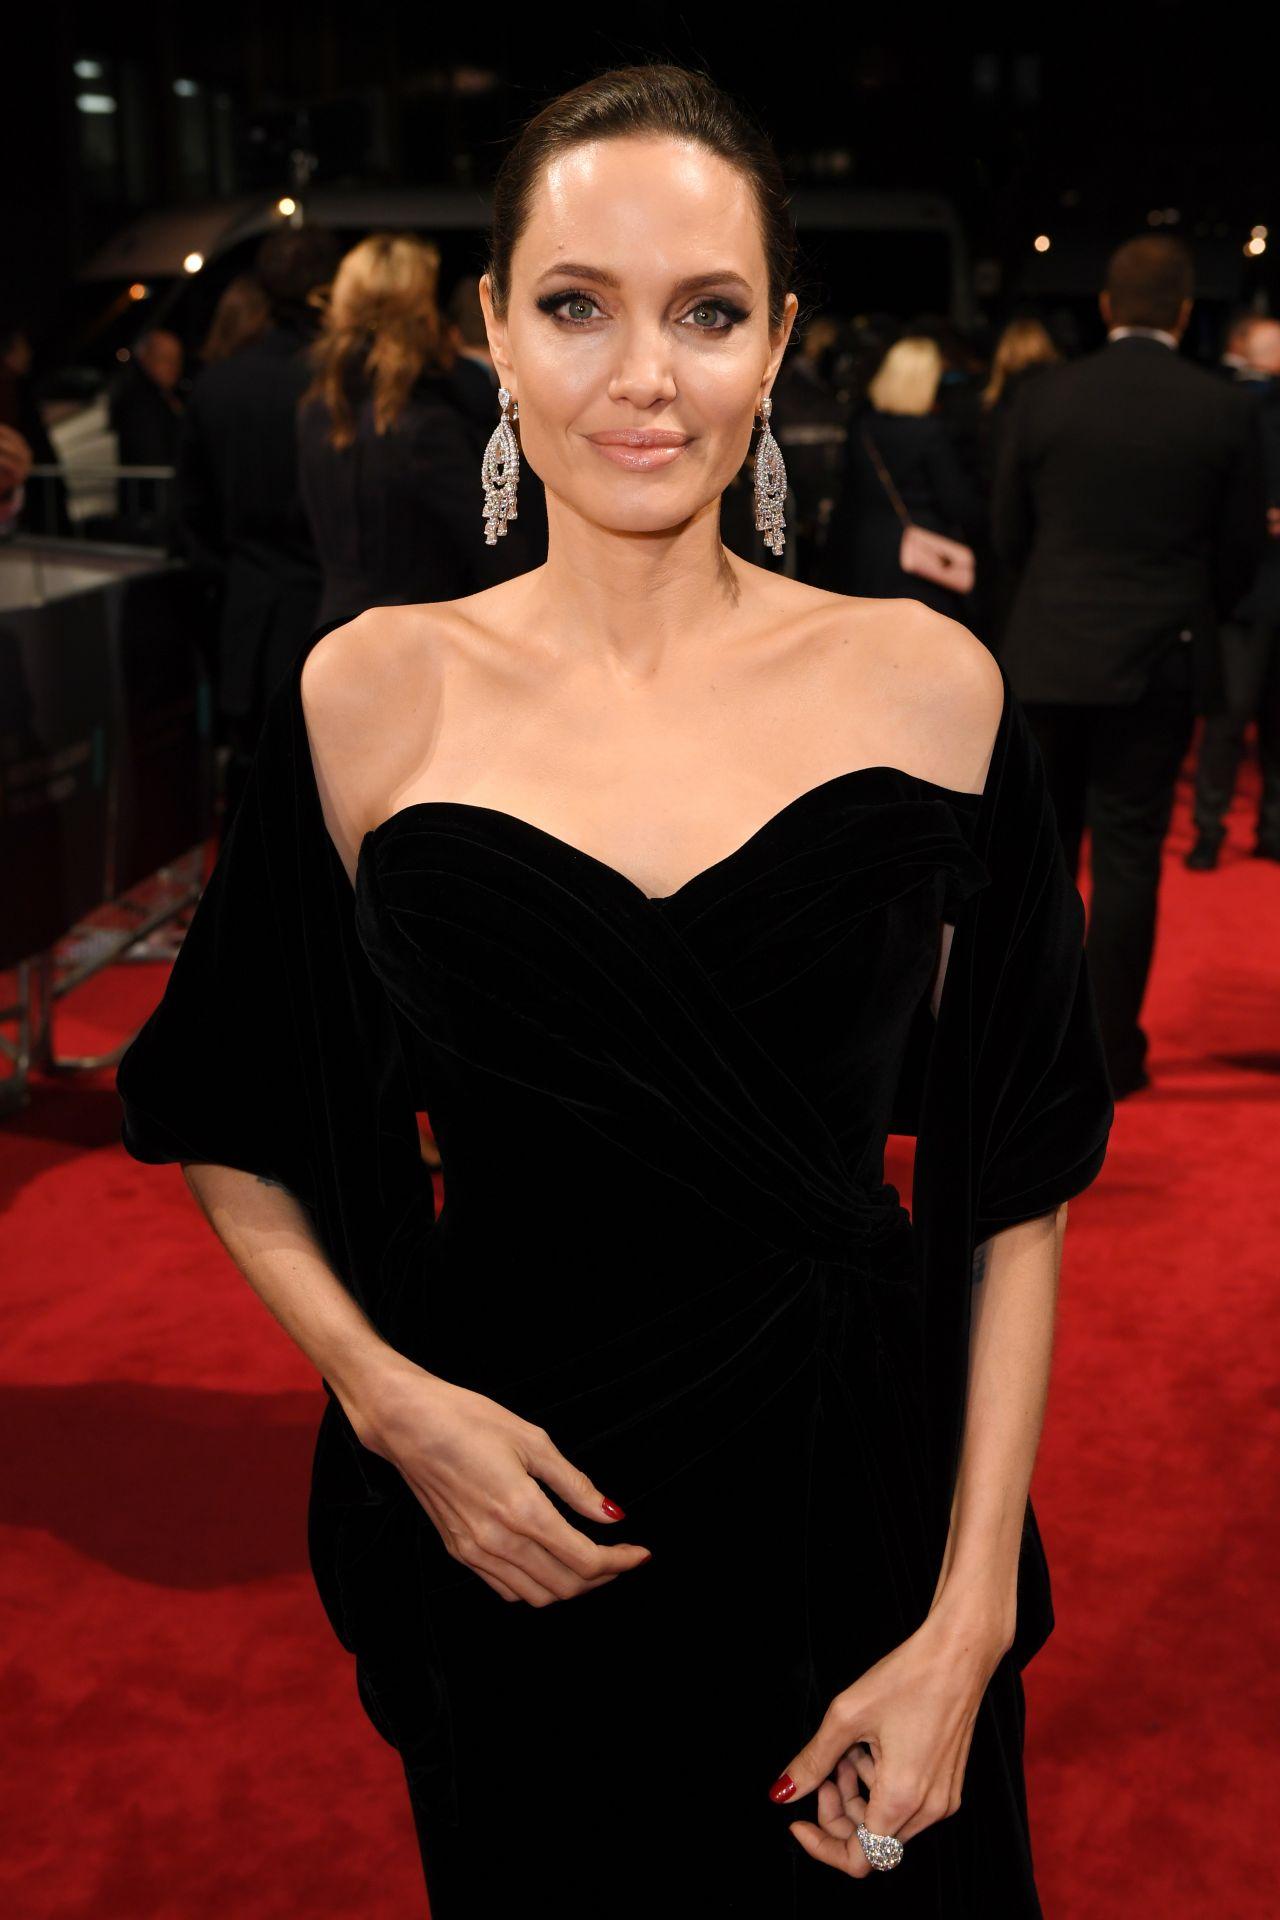 Angelina Jolie - 2018 British Academy Film Awards Angelina Jolie